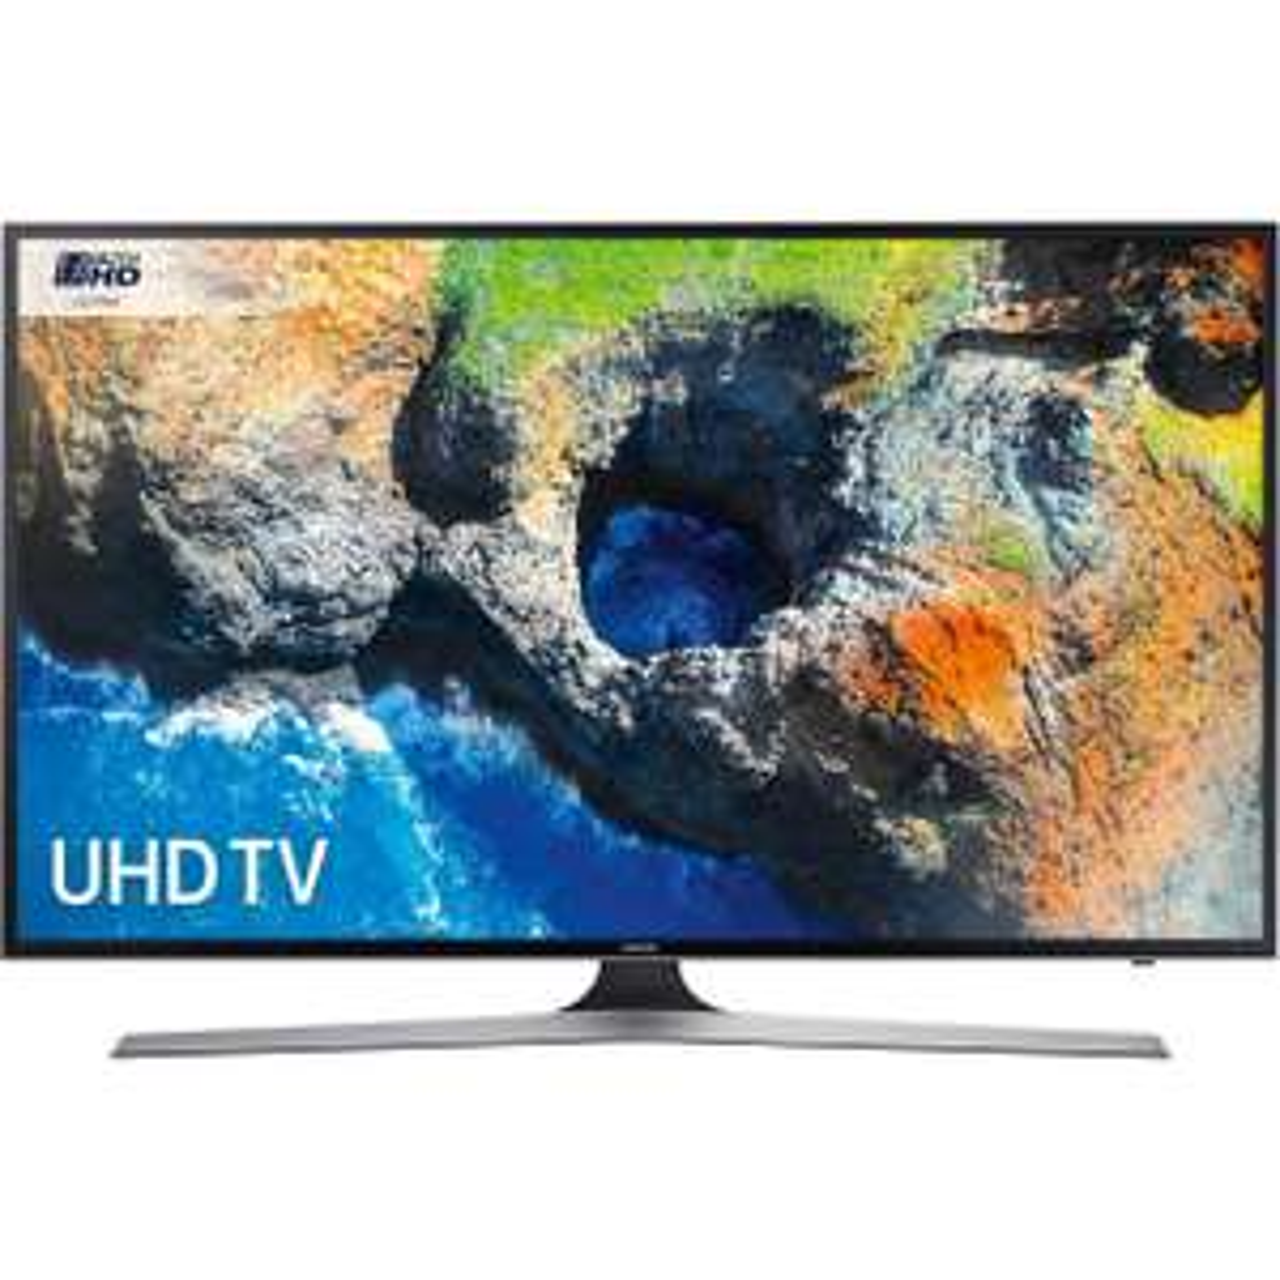 "Samsung UE50MU6120 50"" Smart 4K Ultra HD + Receive 10x UHD movie rentals - £419 (With code) @ AO"